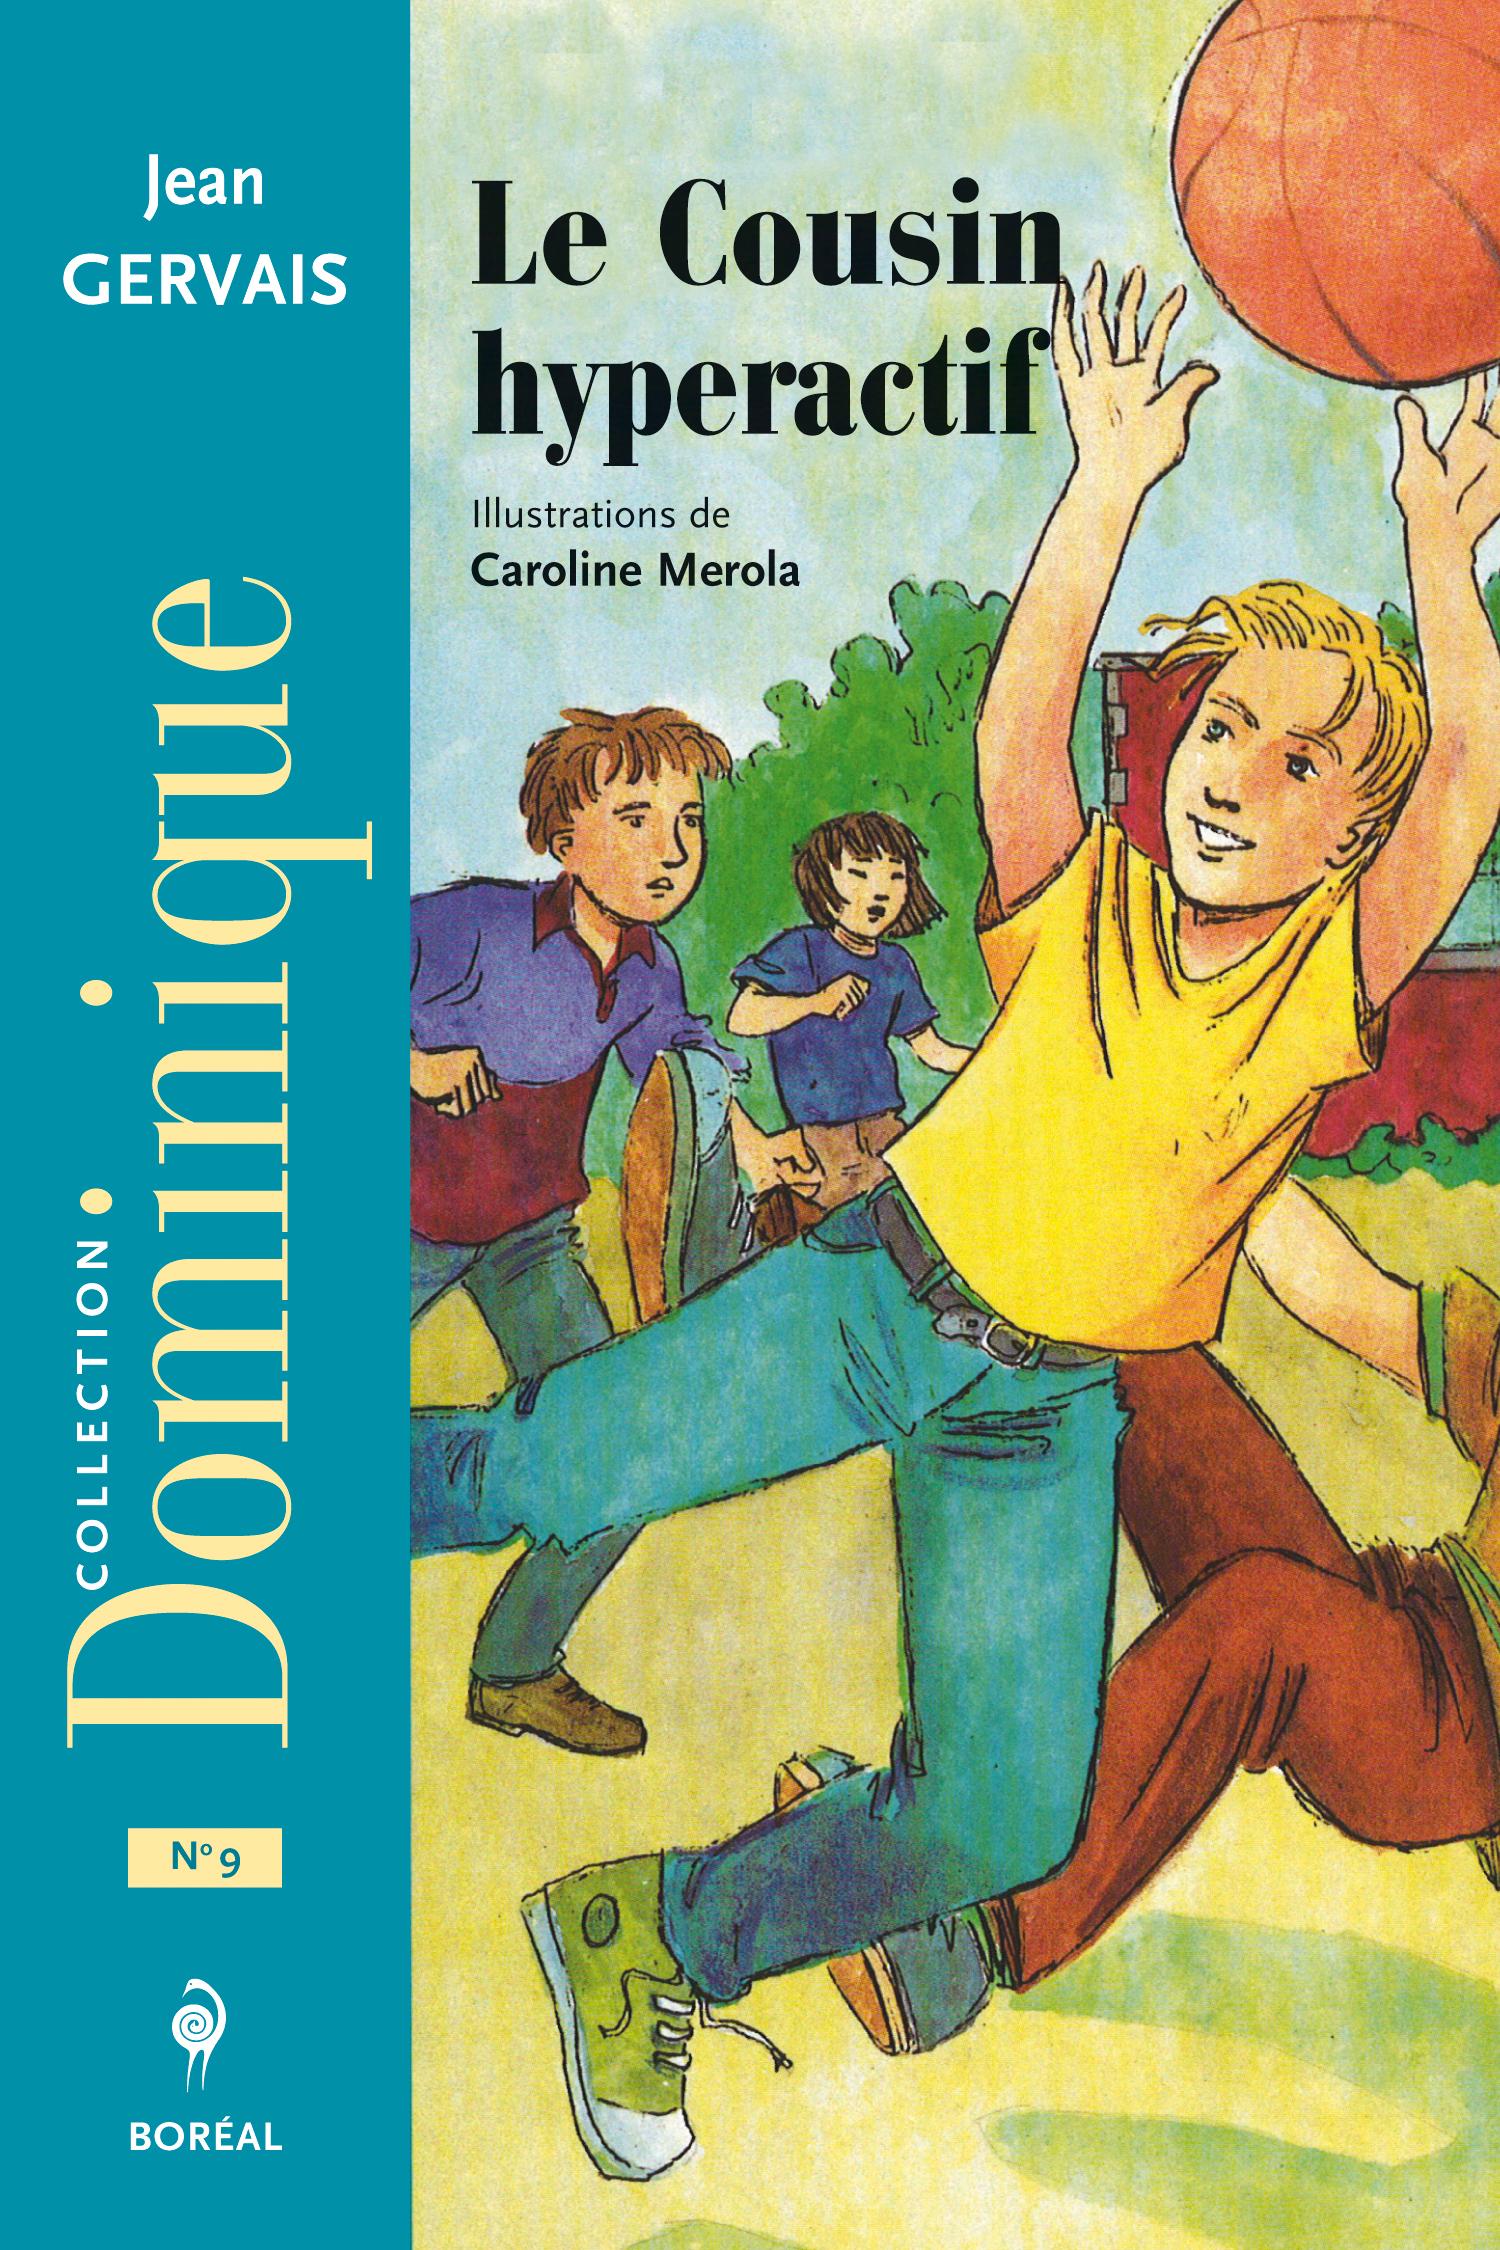 Le Cousin hyperactif